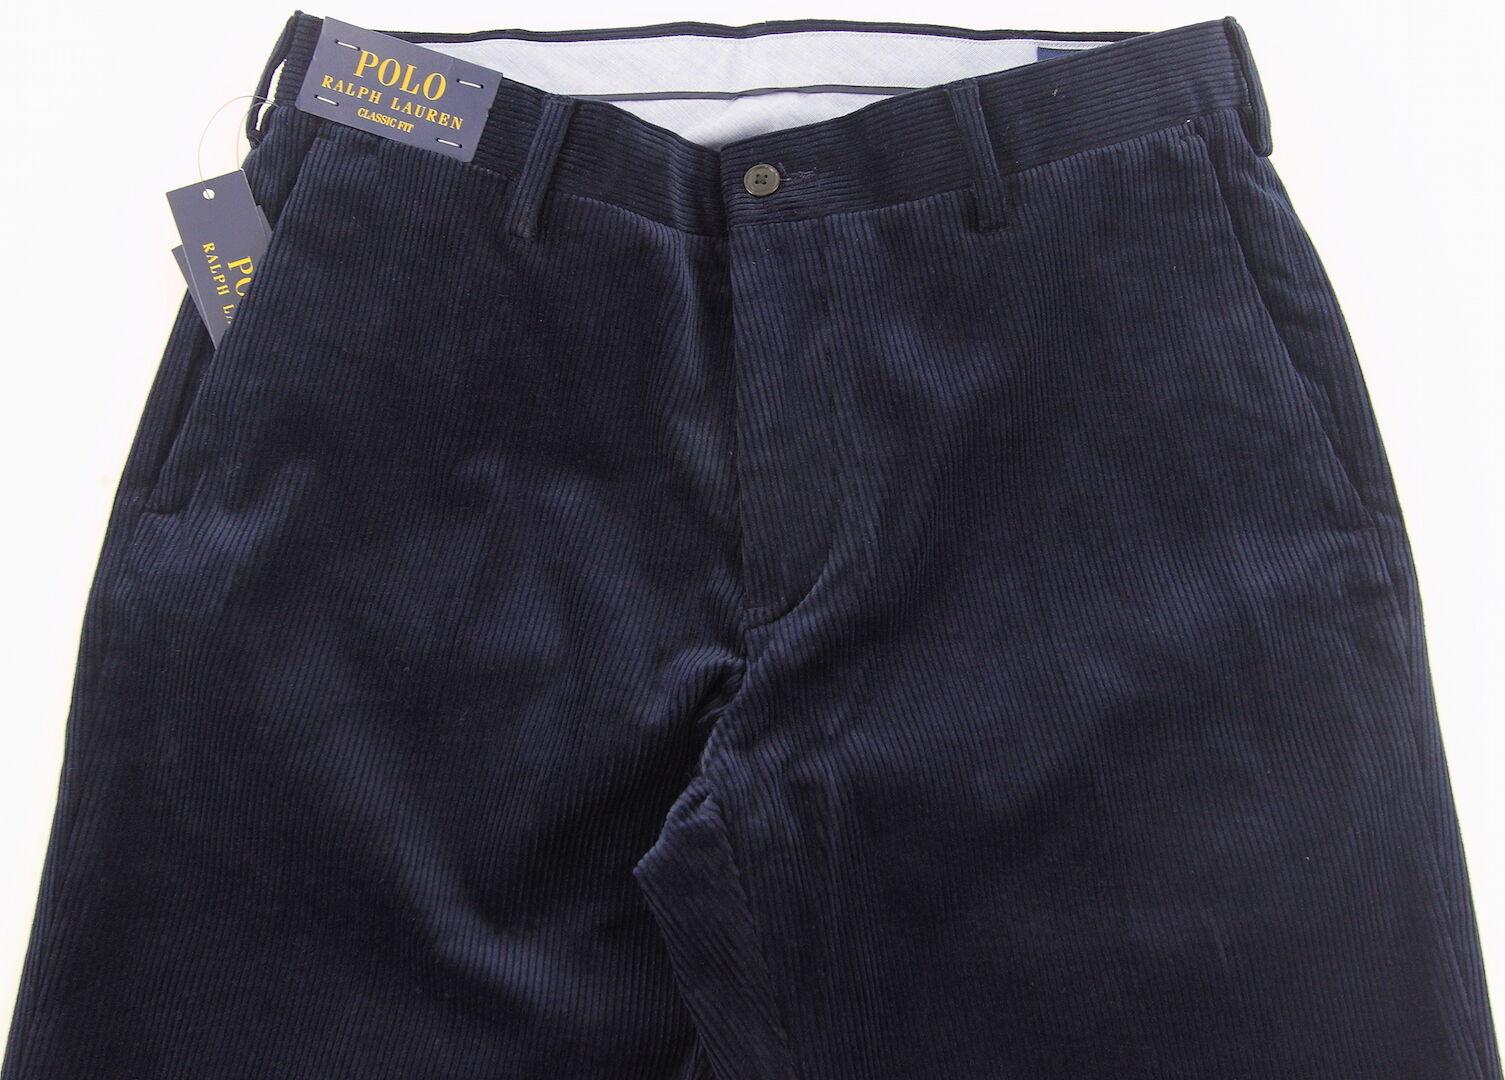 Men's POLO RALPH LAUREN Navy bluee Corduroy Pants 33x32 33 NWT NEW WOW